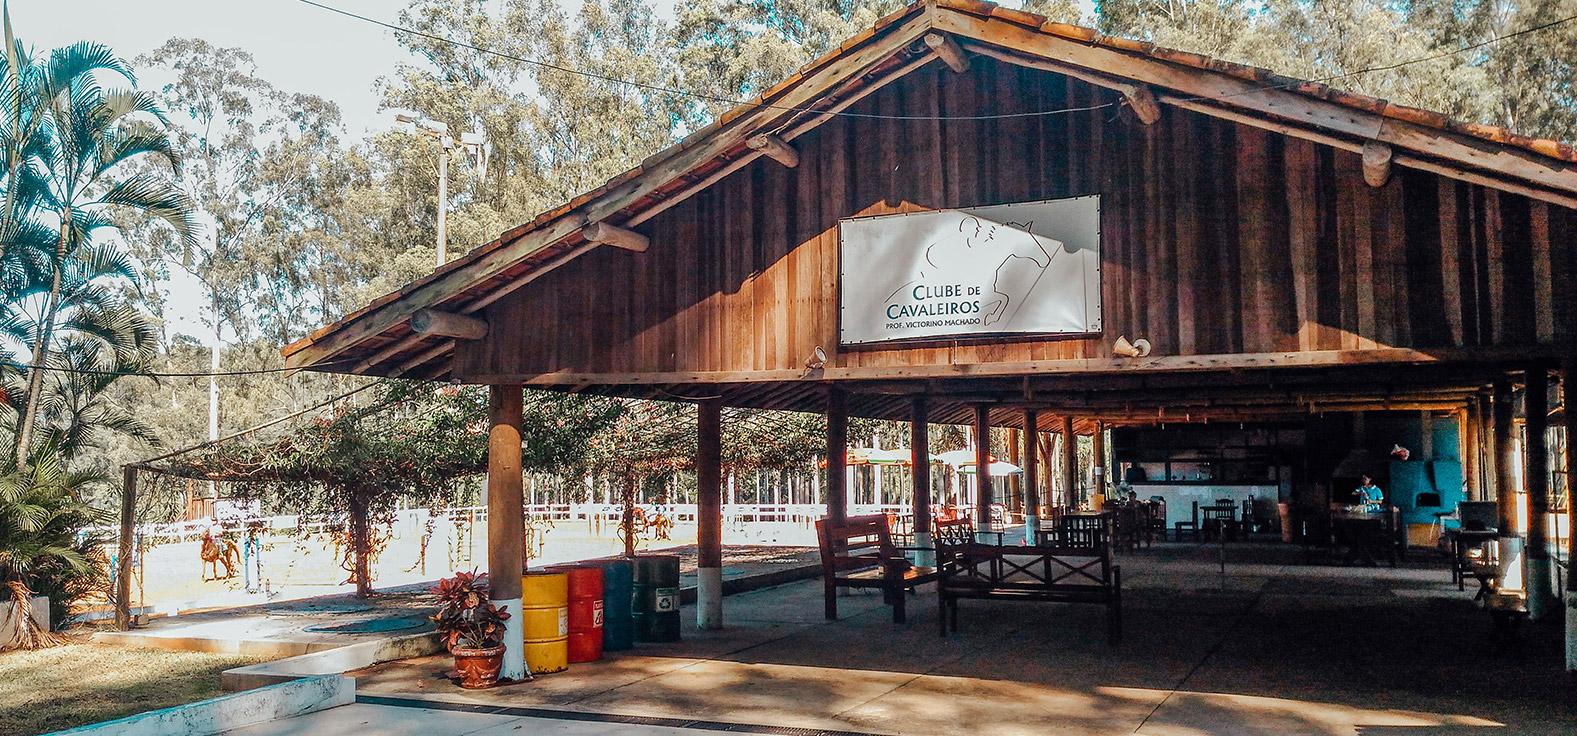 Clube dos Cavaleiros em Rio Claro | Portal Serra do Itaquerí